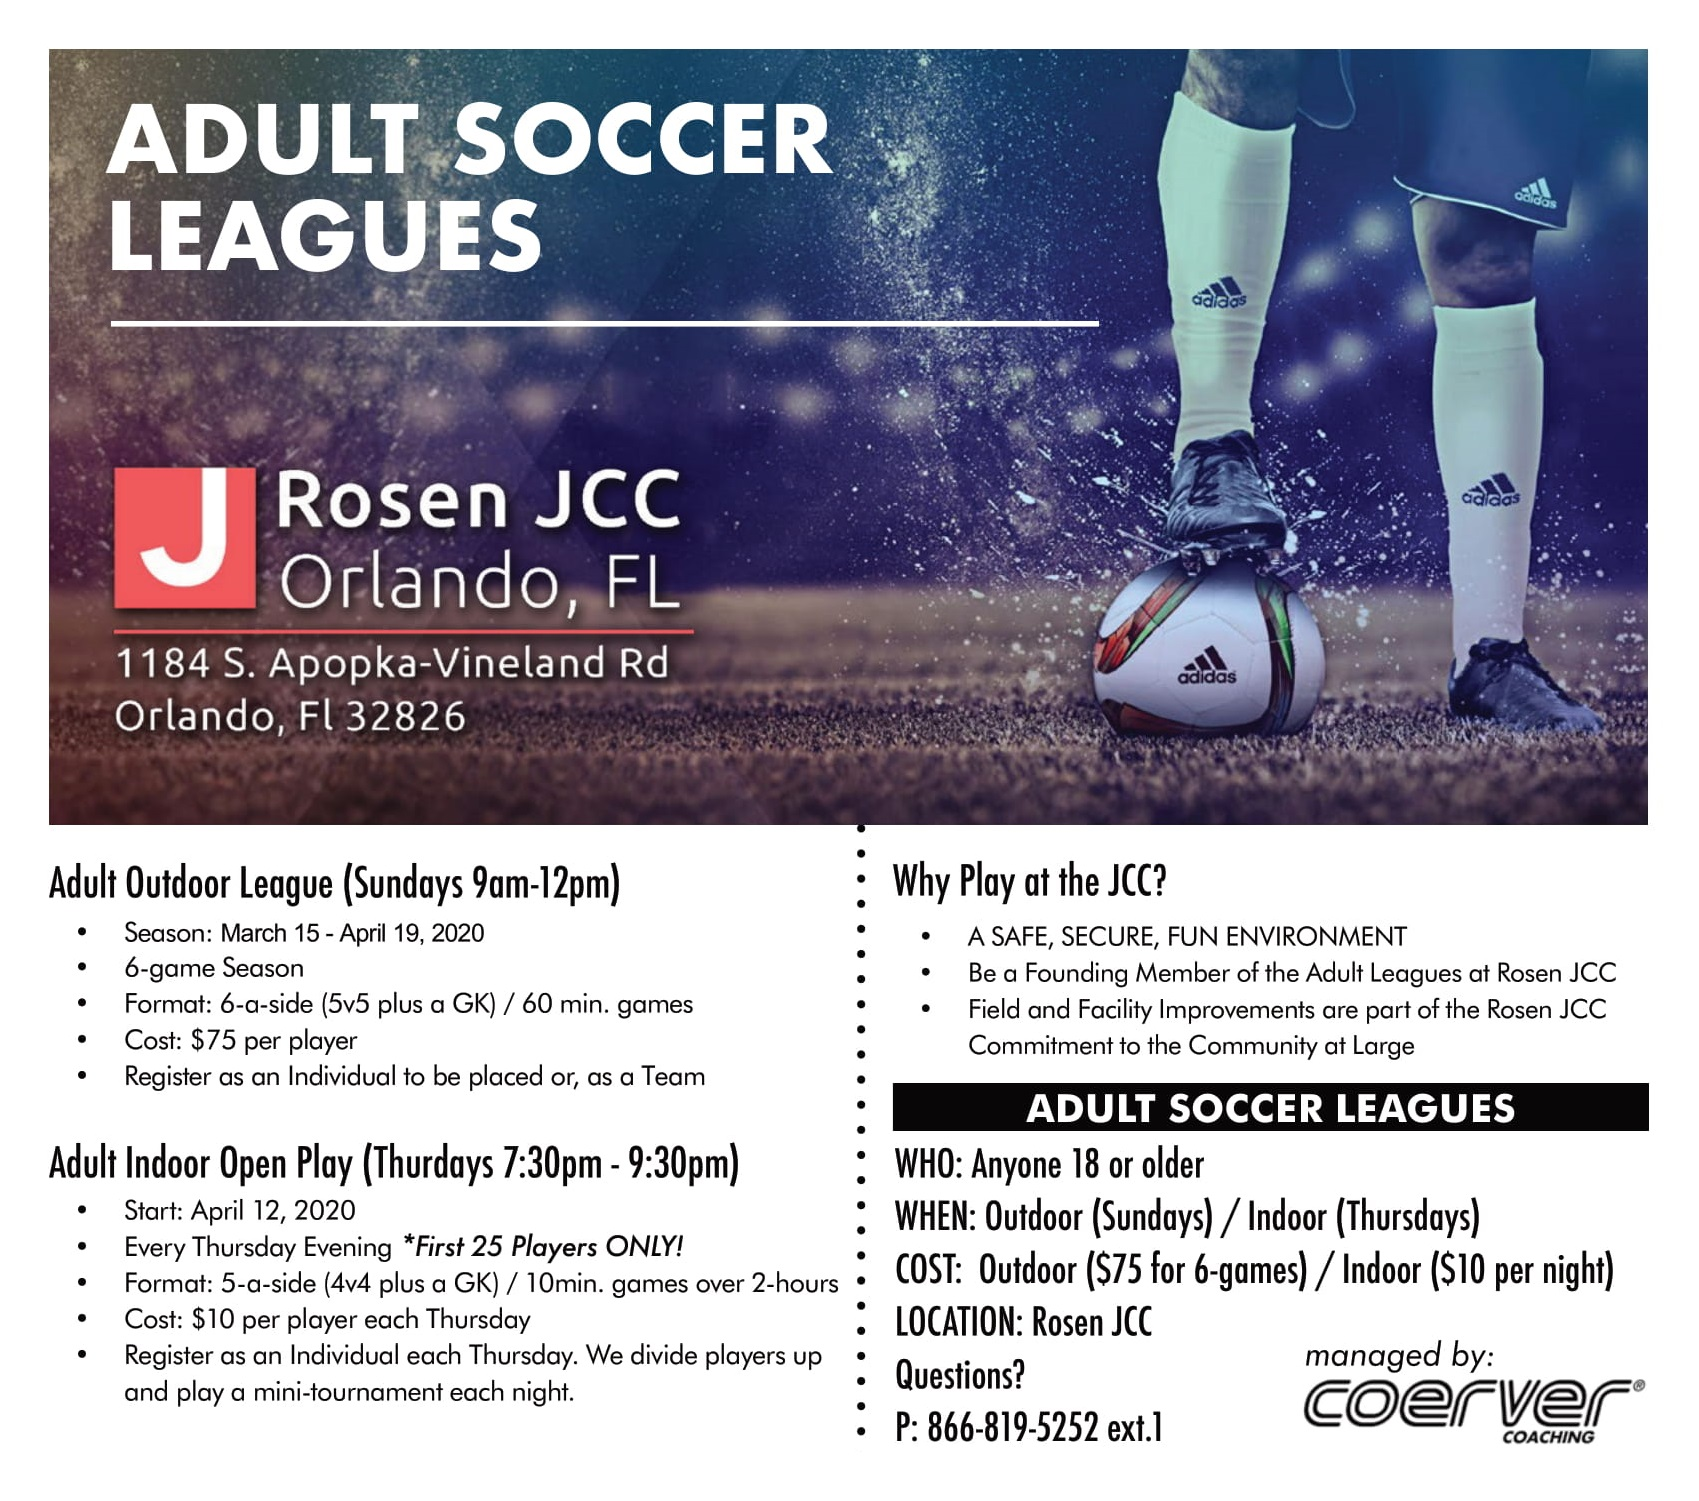 Adult Soccer Leagues